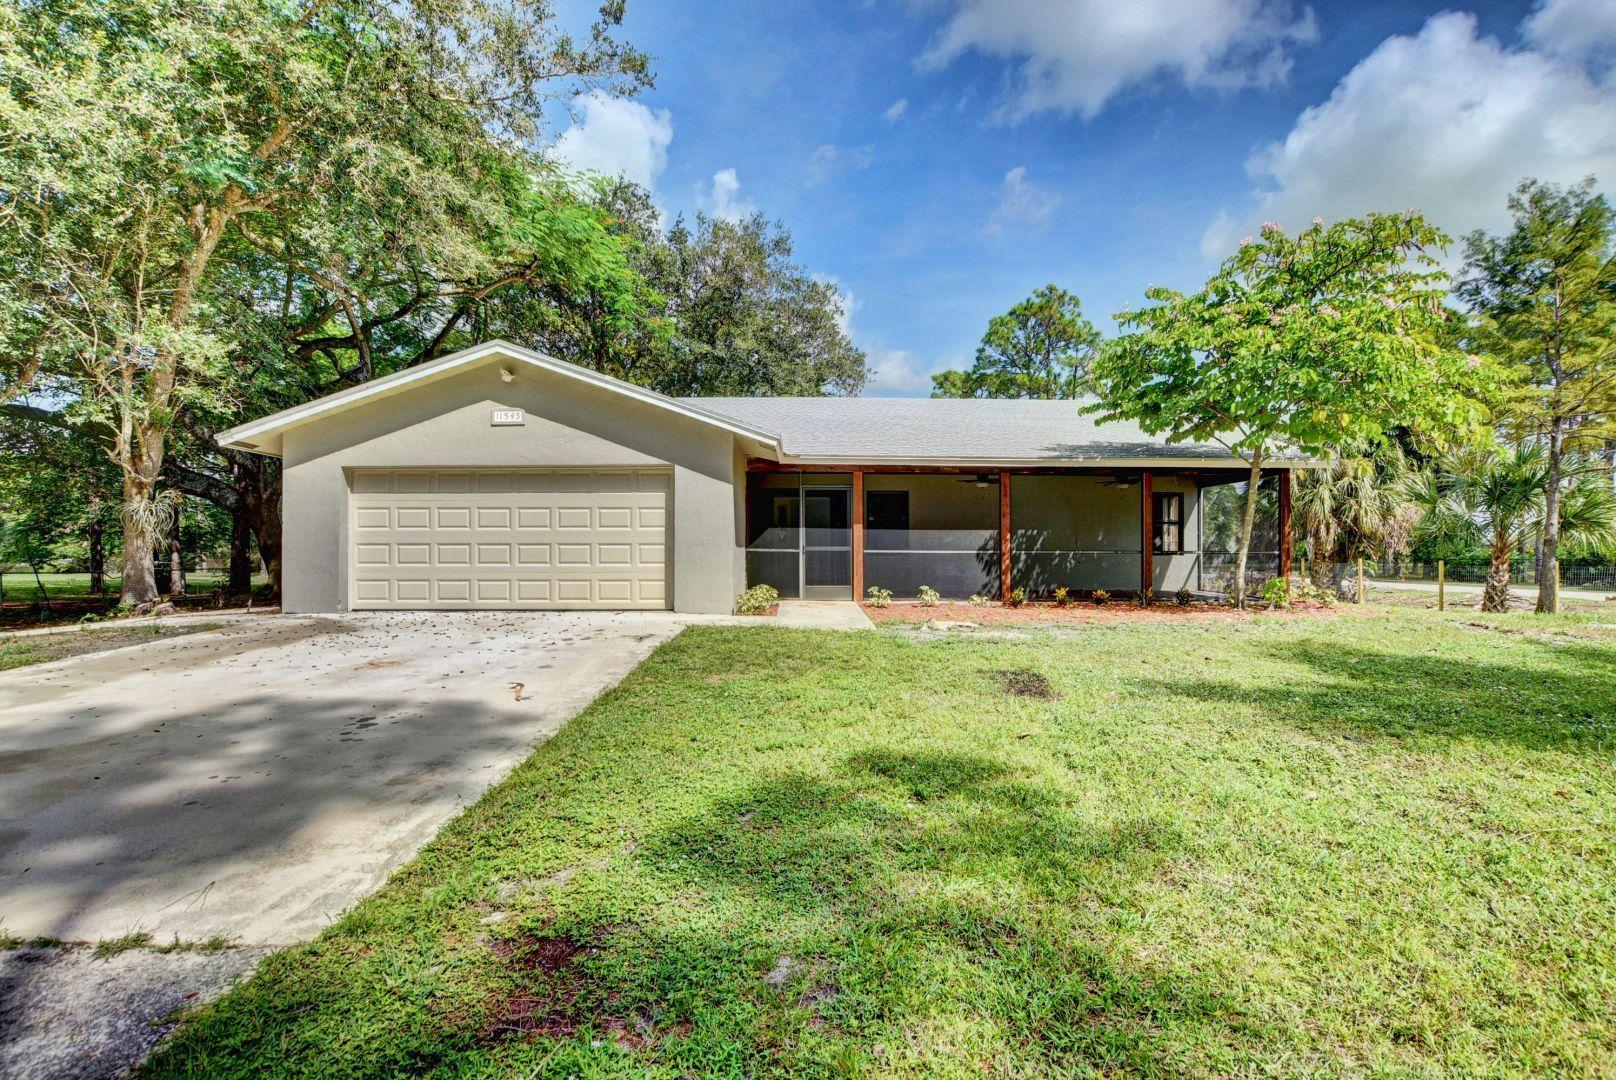 11545 68th Street N, Loxahatchee in Palm Beach County, FL 33470 Home for Sale